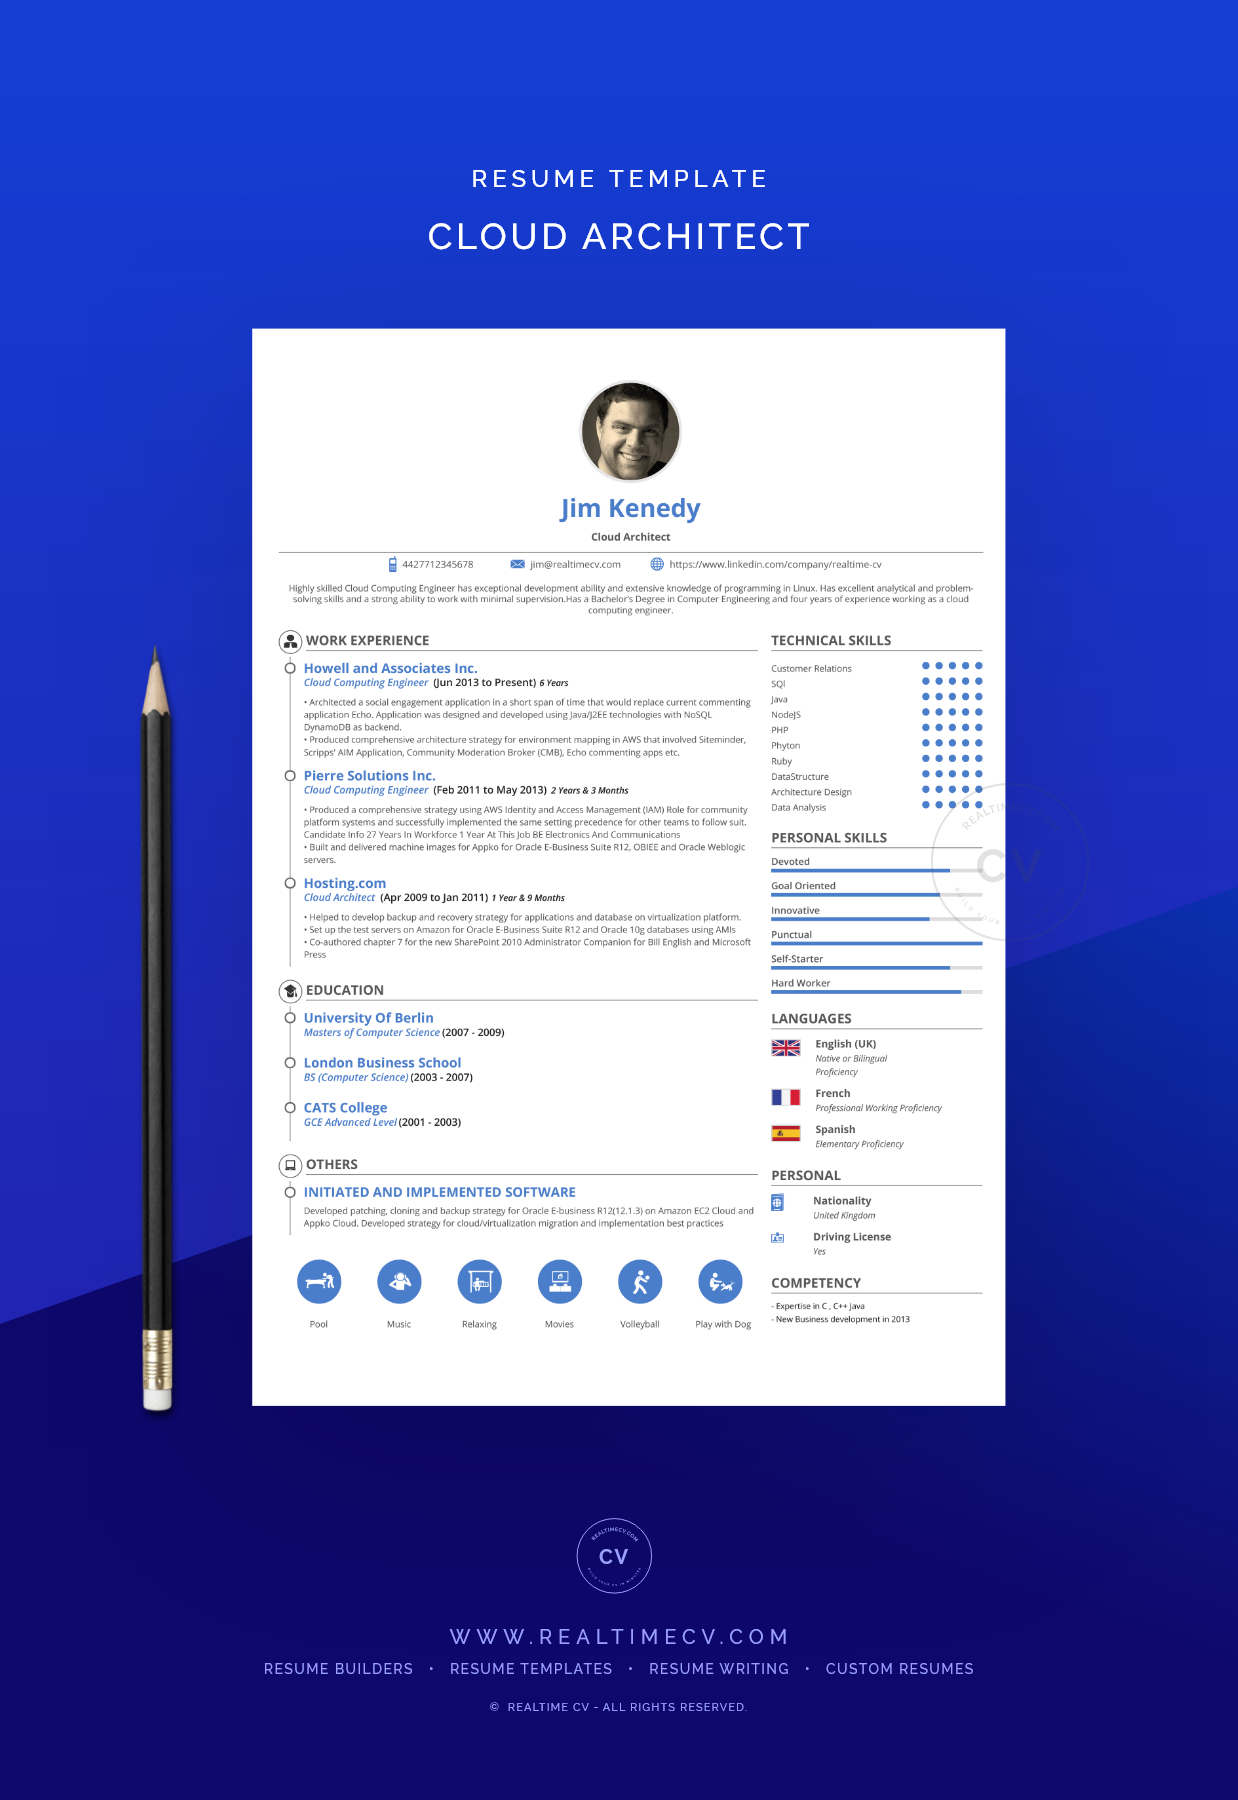 Cloud Architect Resume Template Architect Resume Architect Resume Sample Creative Resume Templates